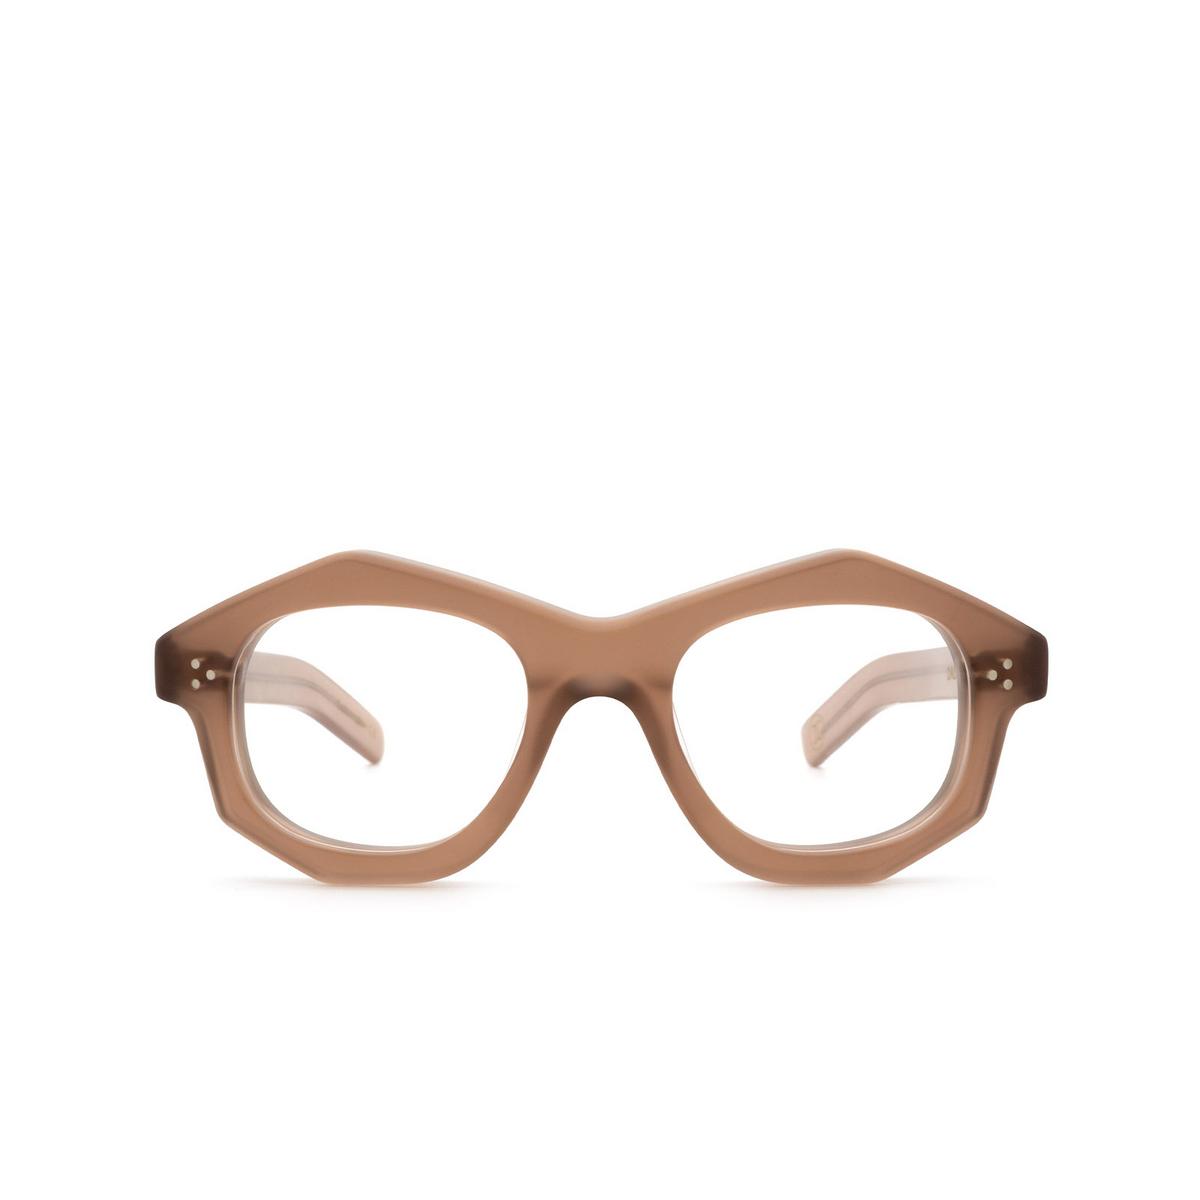 Lesca® Irregular Eyeglasses: Dada color Chair Matt 2 - front view.